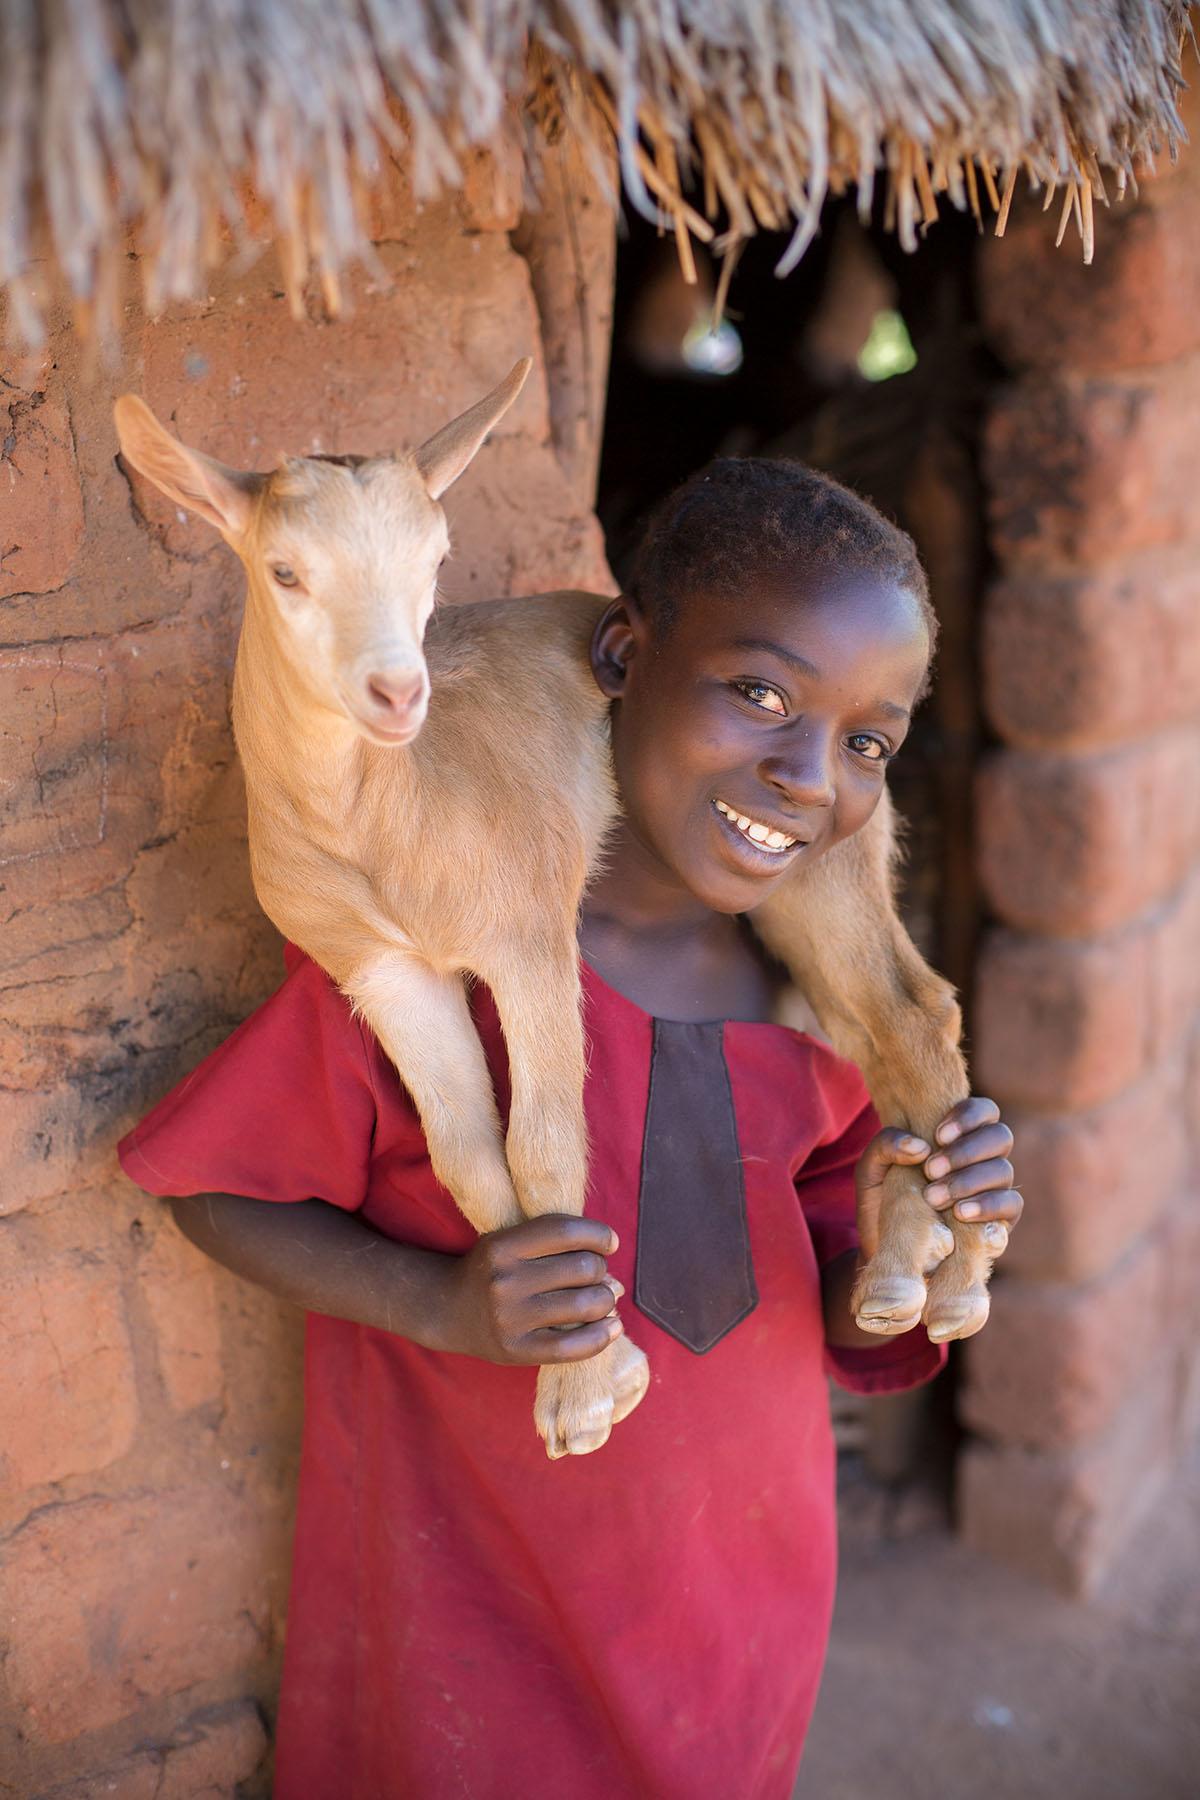 Royce (11) holds a goat in Luangwa, Zambia.